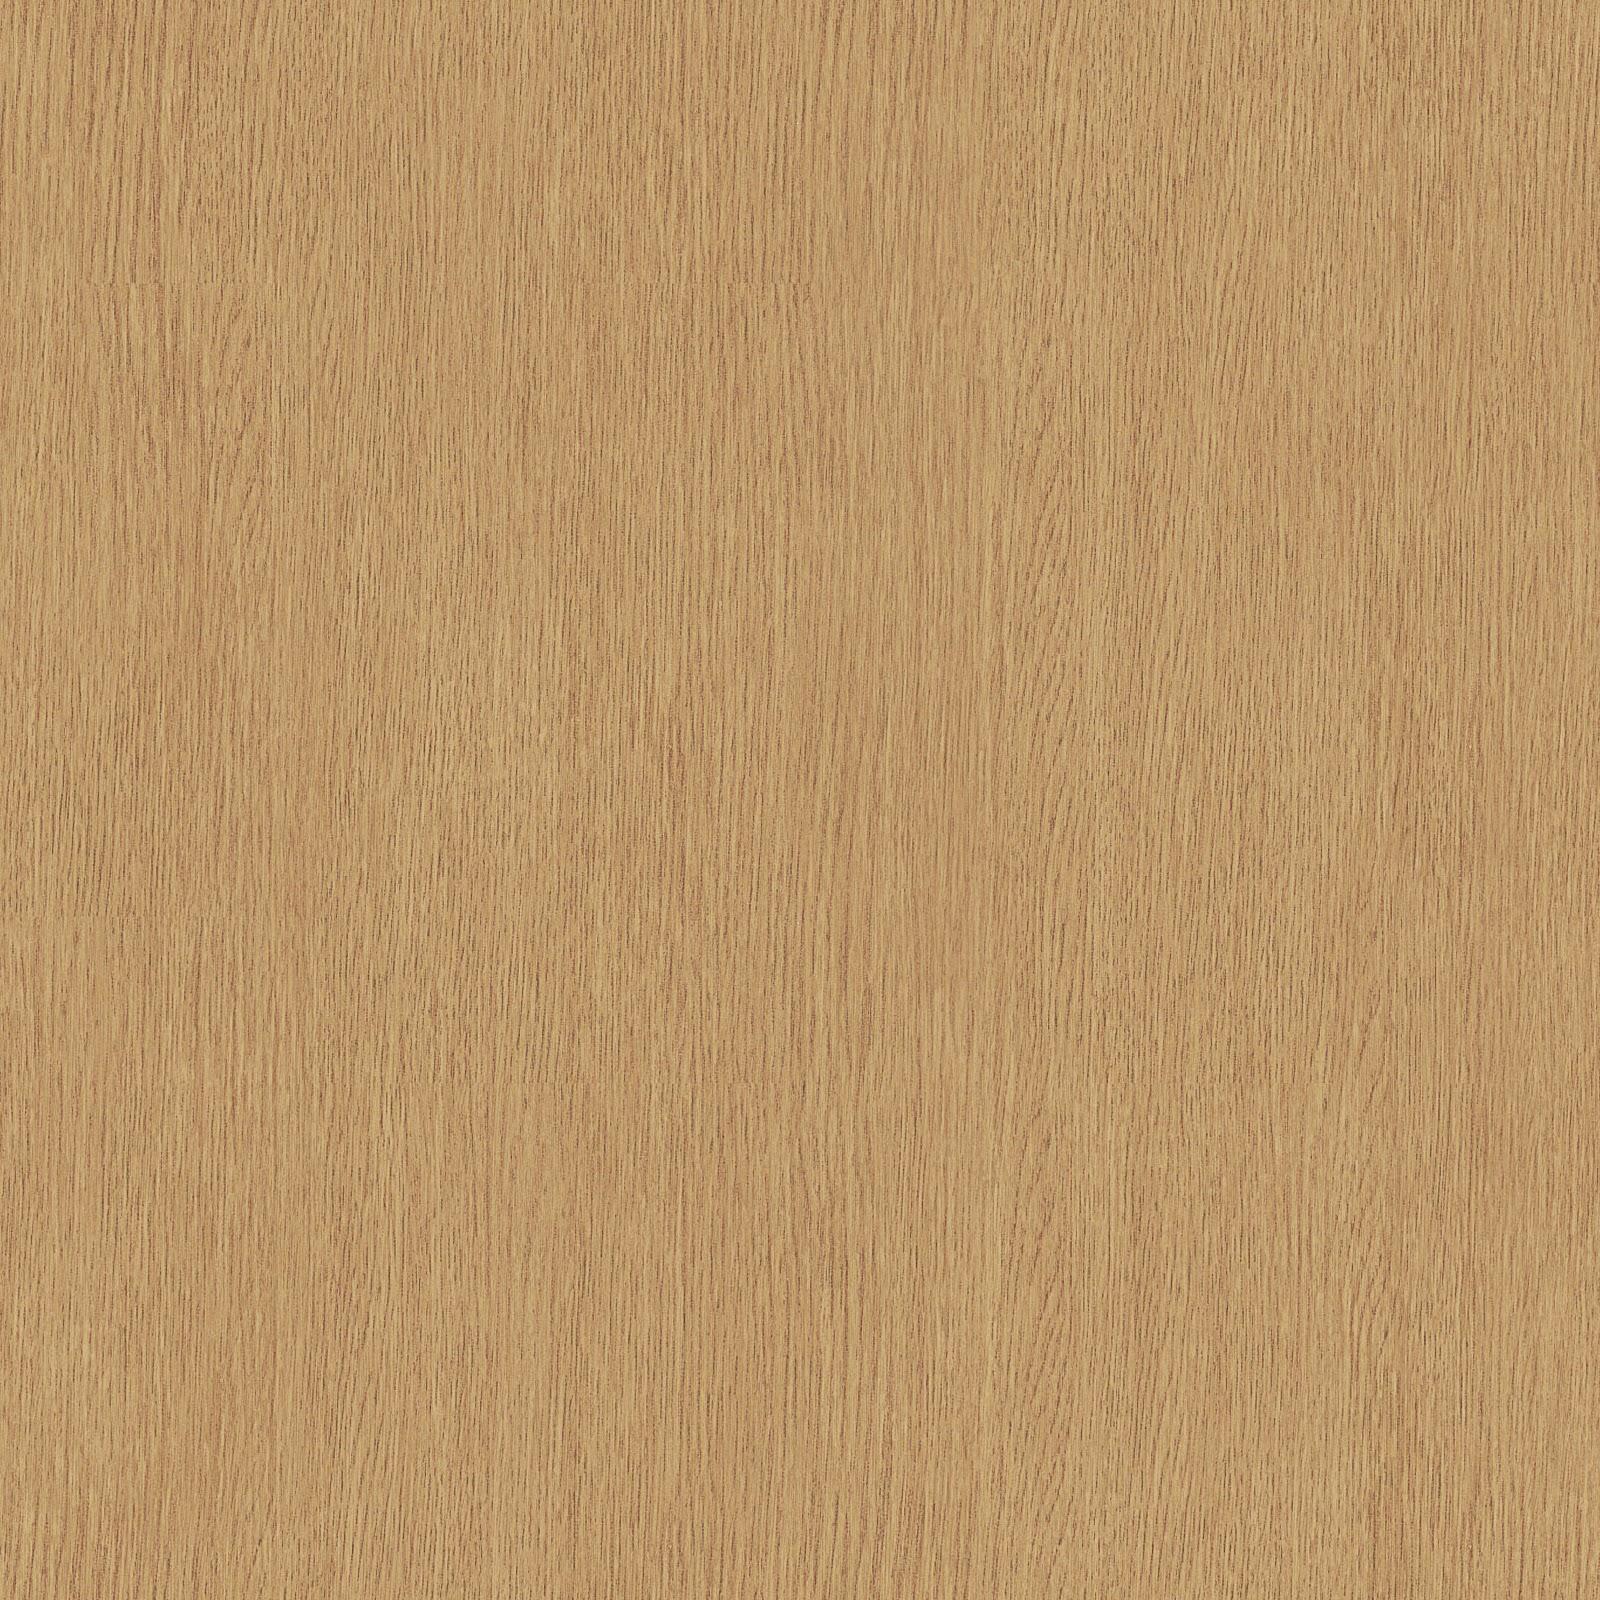 Seamless Glued Laminated Birch Wood Maps Texturise